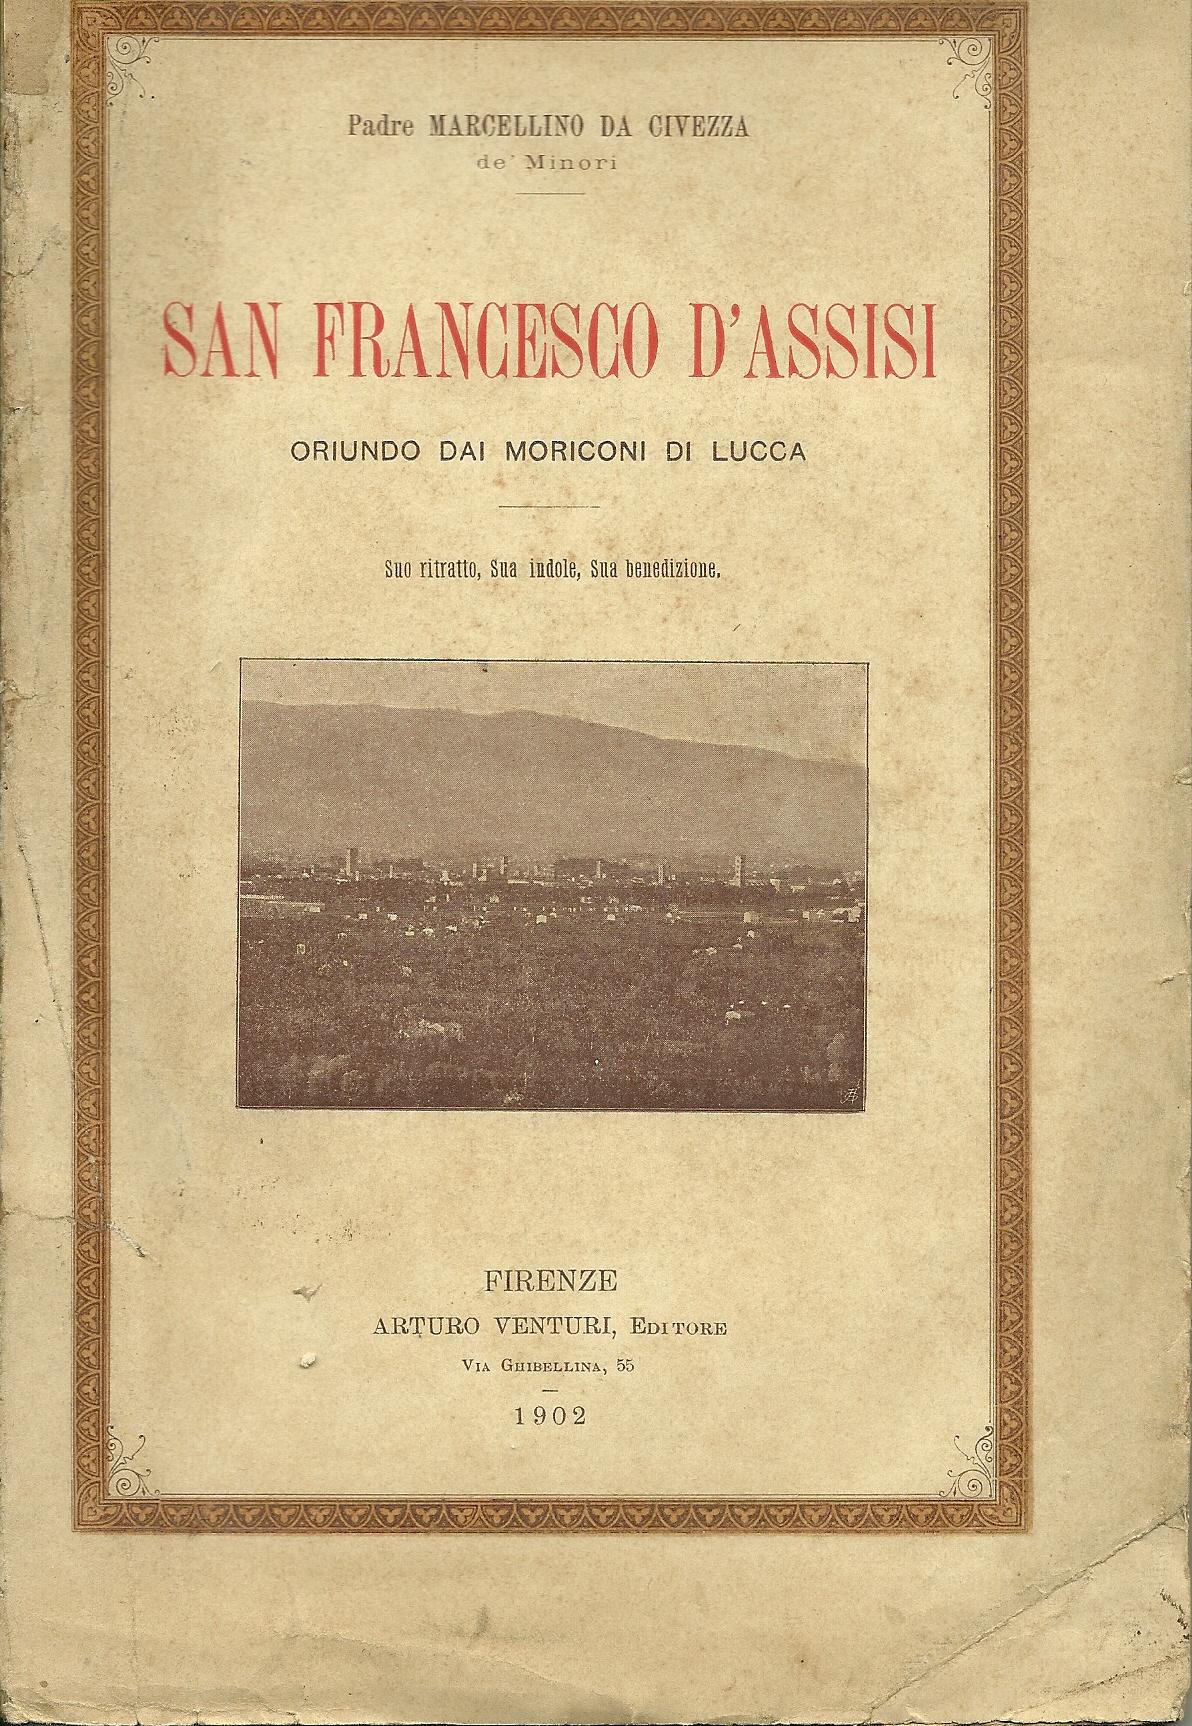 San Francesco d'Assisi oriundo dai Moriconi di Lucca